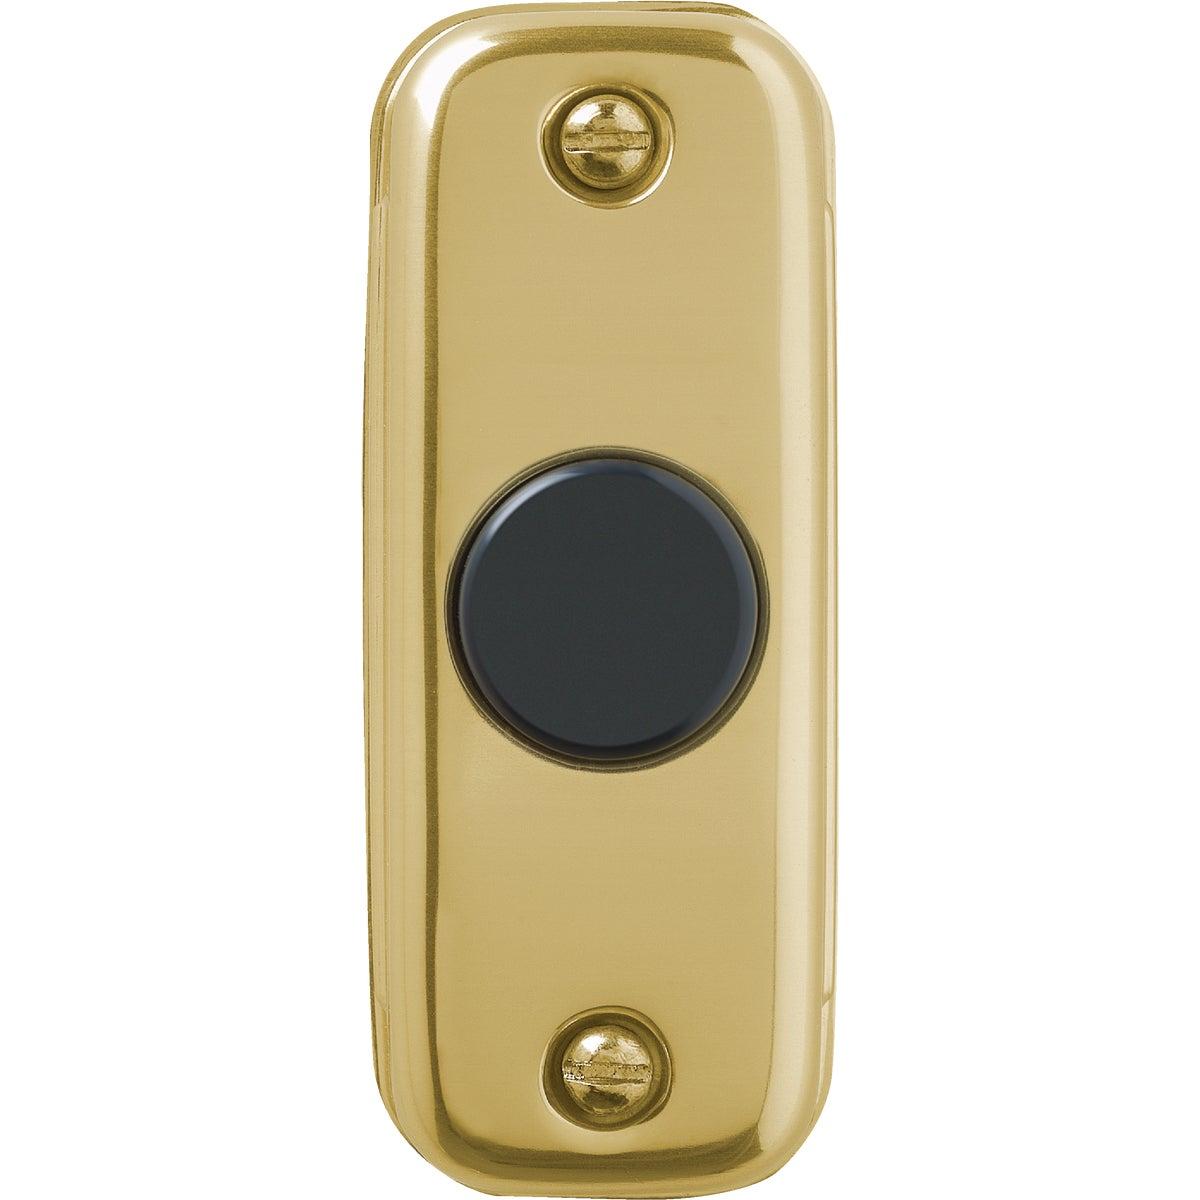 Thomas & Betts DH1805 Carlon Push-Button-GOLD PUSH-BUTTON